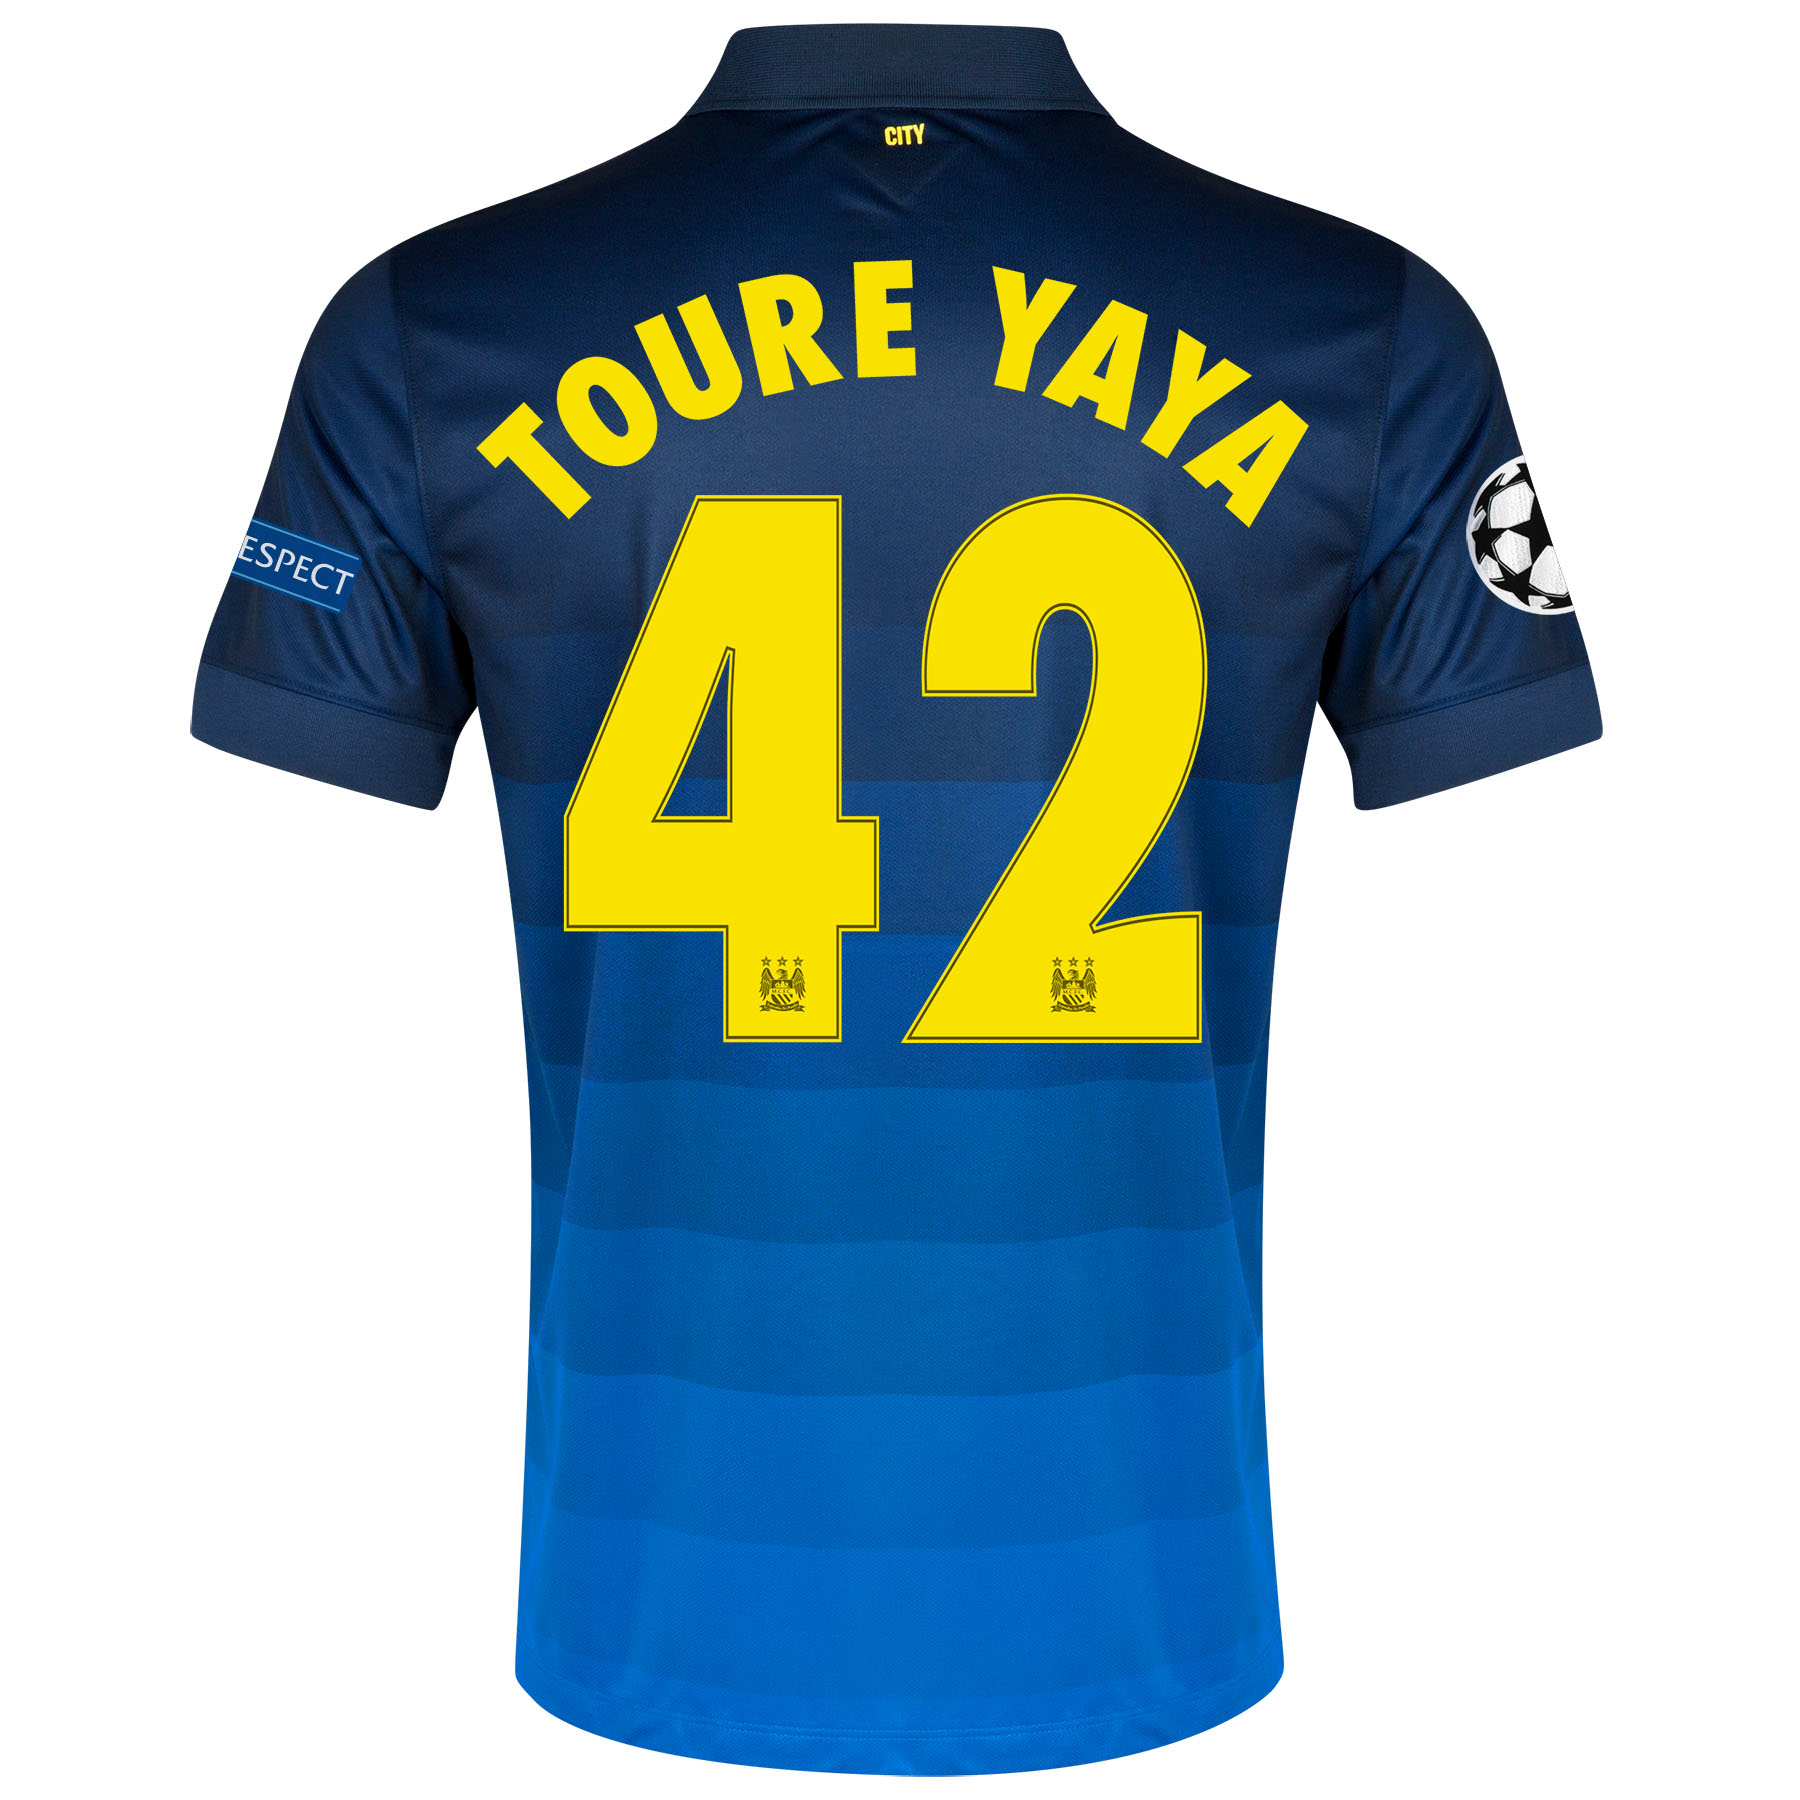 Manchester City UEFA Champions League Away Shirt 2014/15 - Kids with Toure Yaya 42 printing